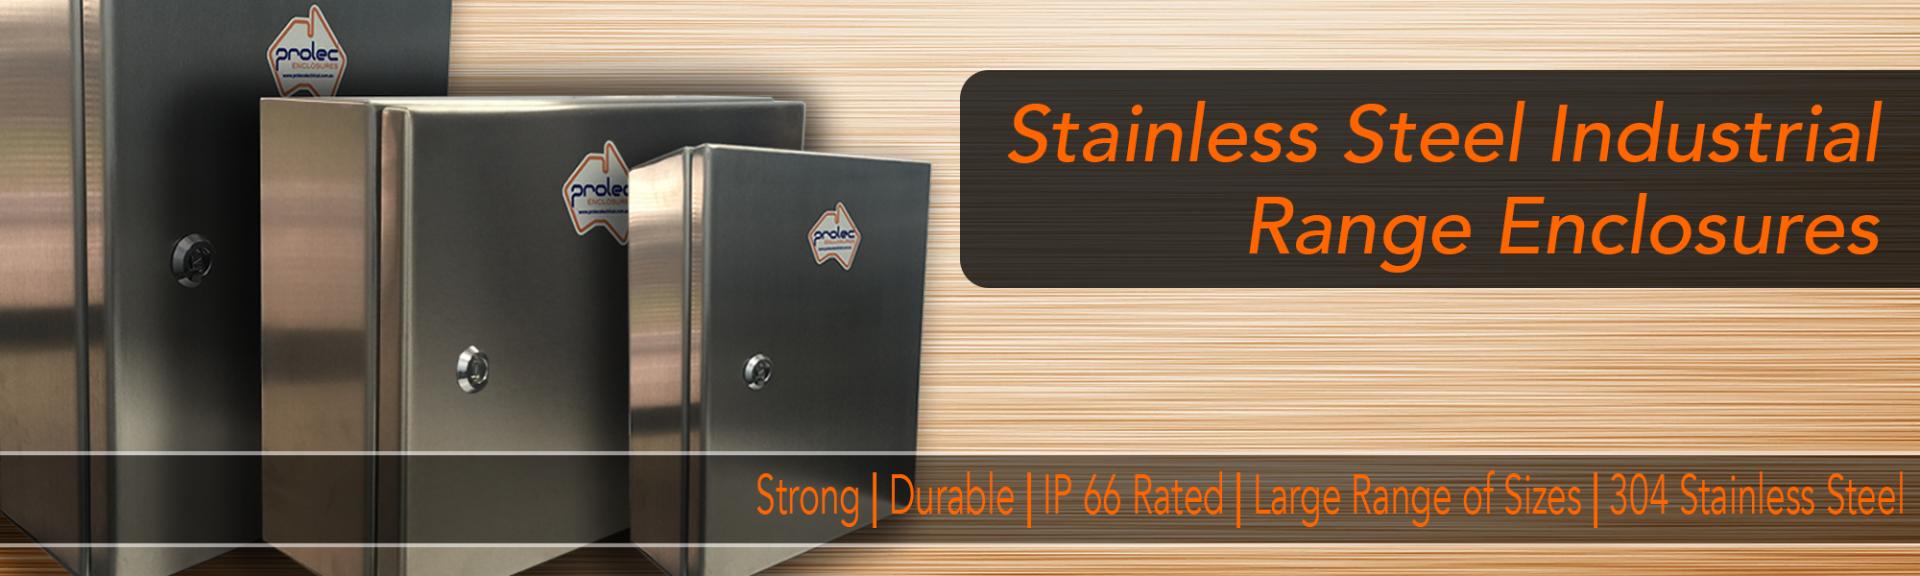 Standard Stainless Steel Enclosures Prolec Australia